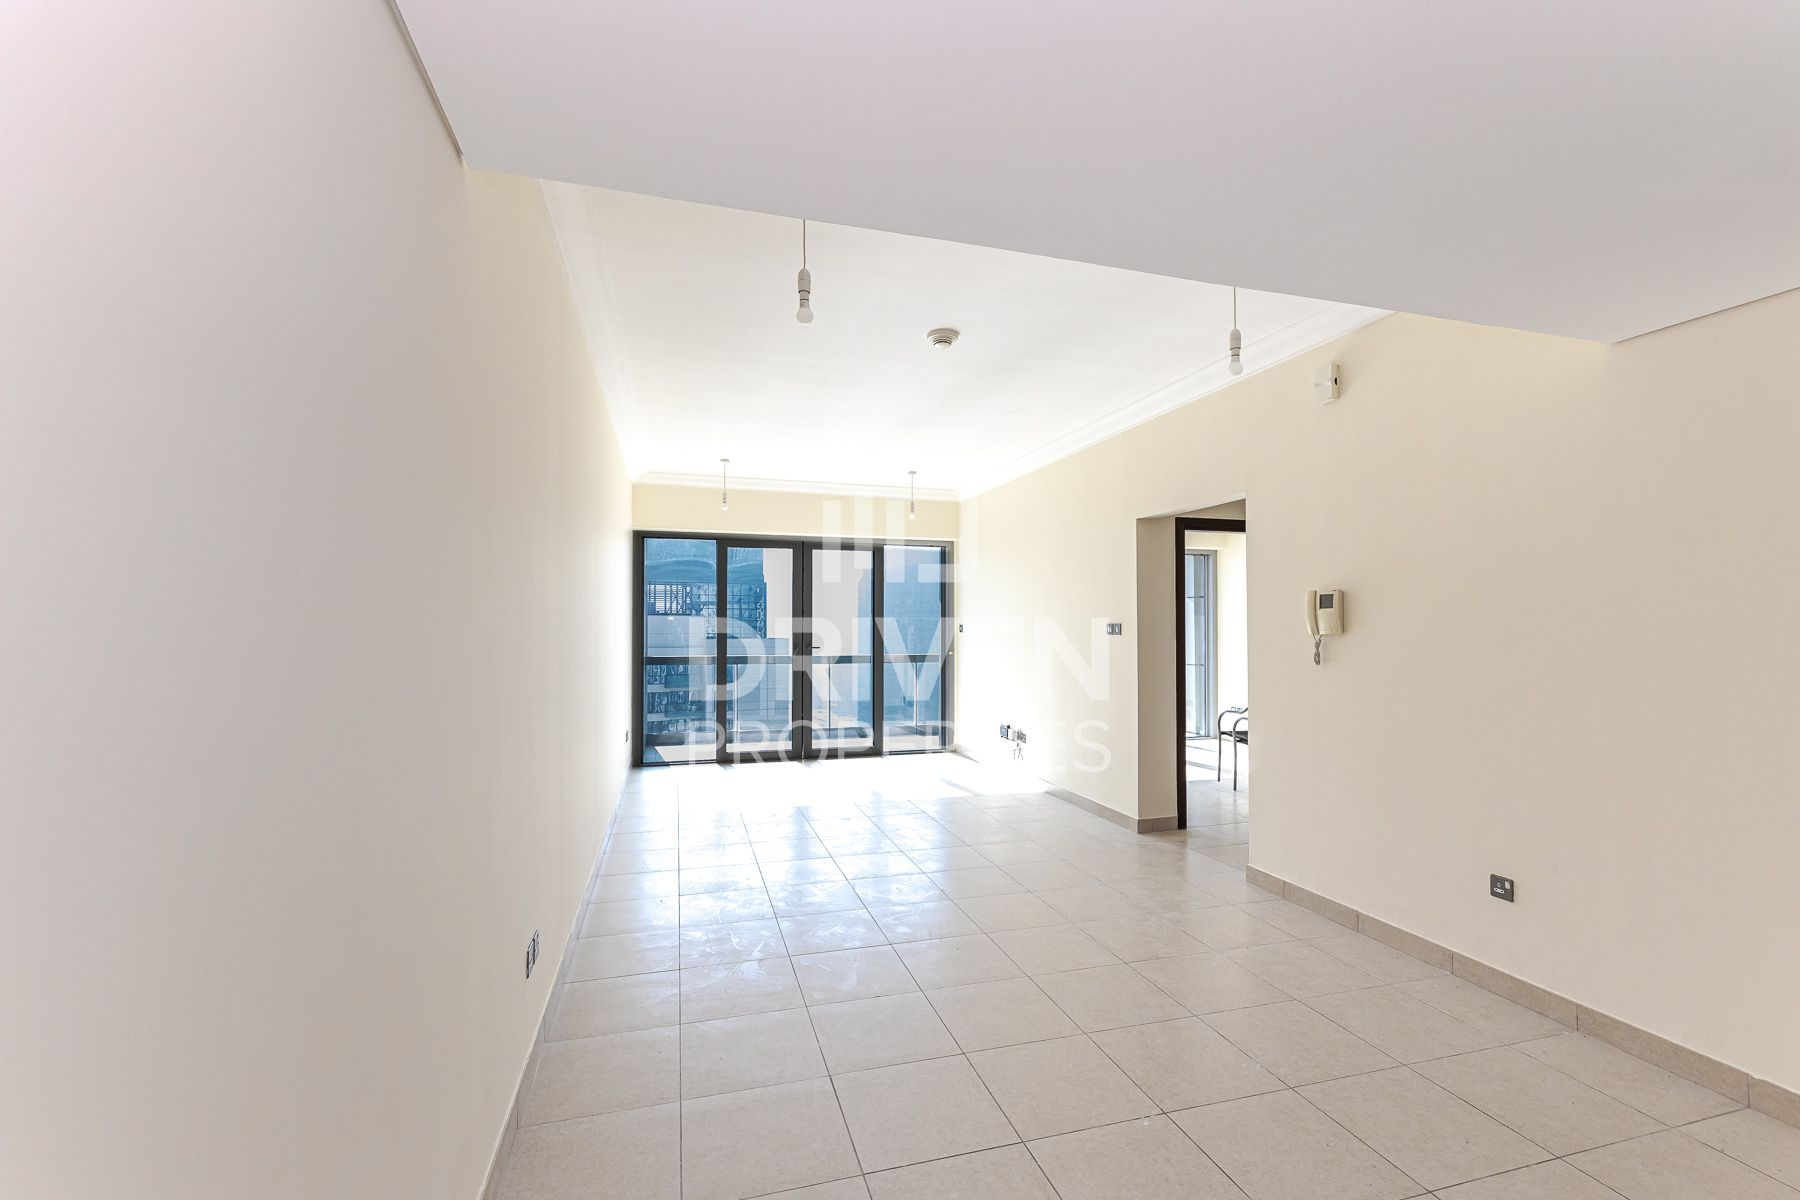 Apartment for Rent in 8 Boulevard Walk - Downtown Dubai